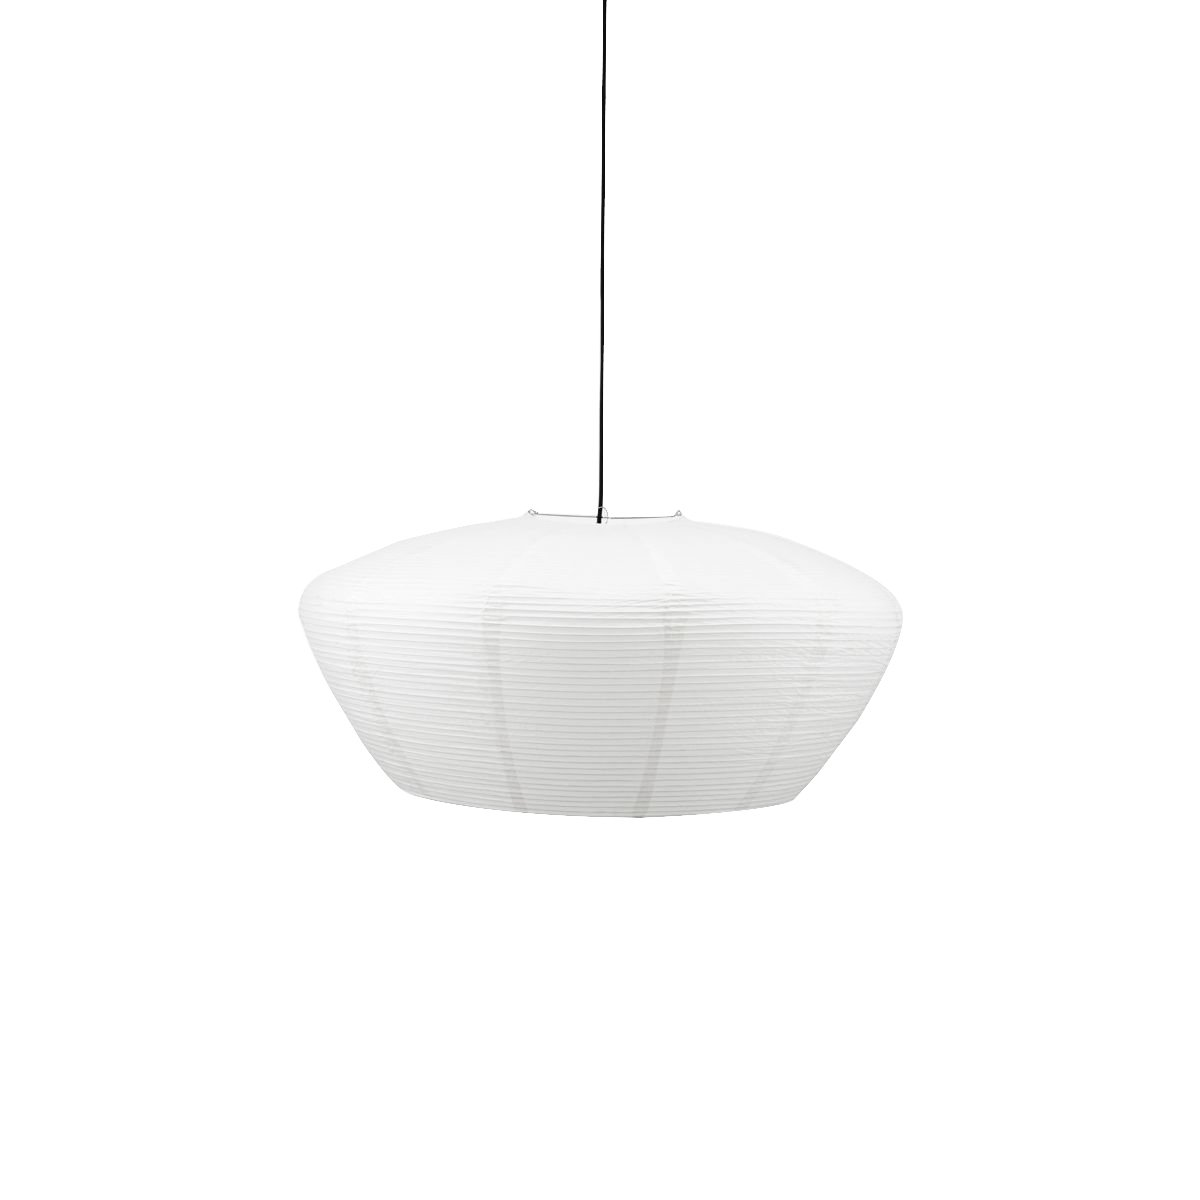 House Doctor - Bidar Lamp Shade Ø 81,5 cm - White (259370100)